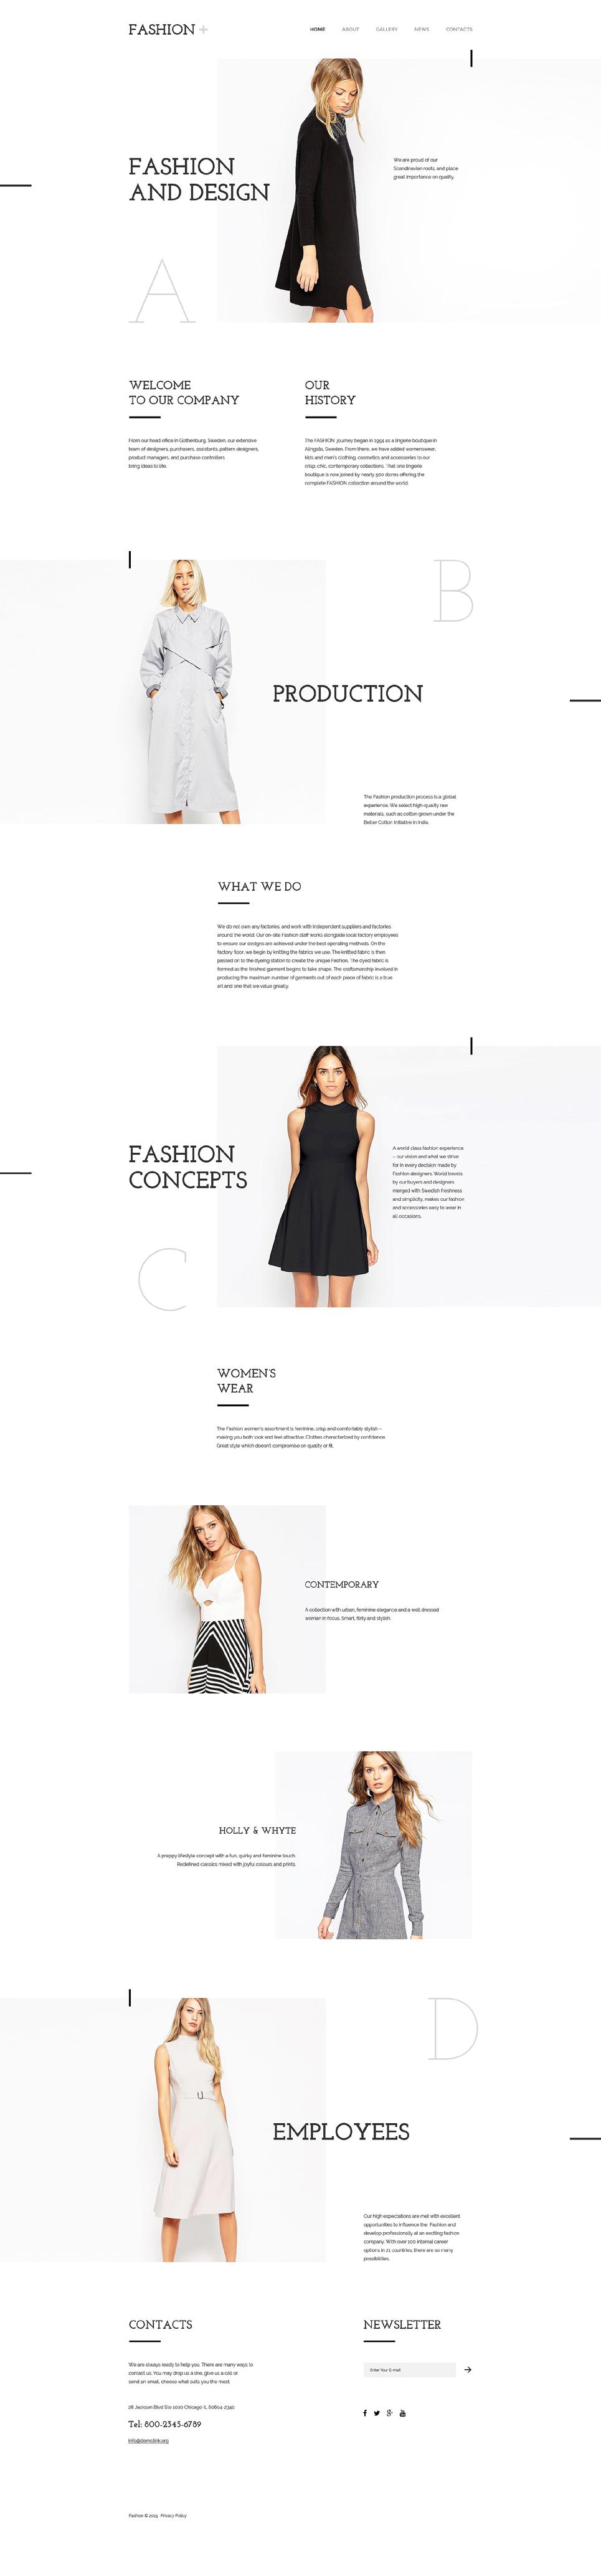 Fashion template illustration image